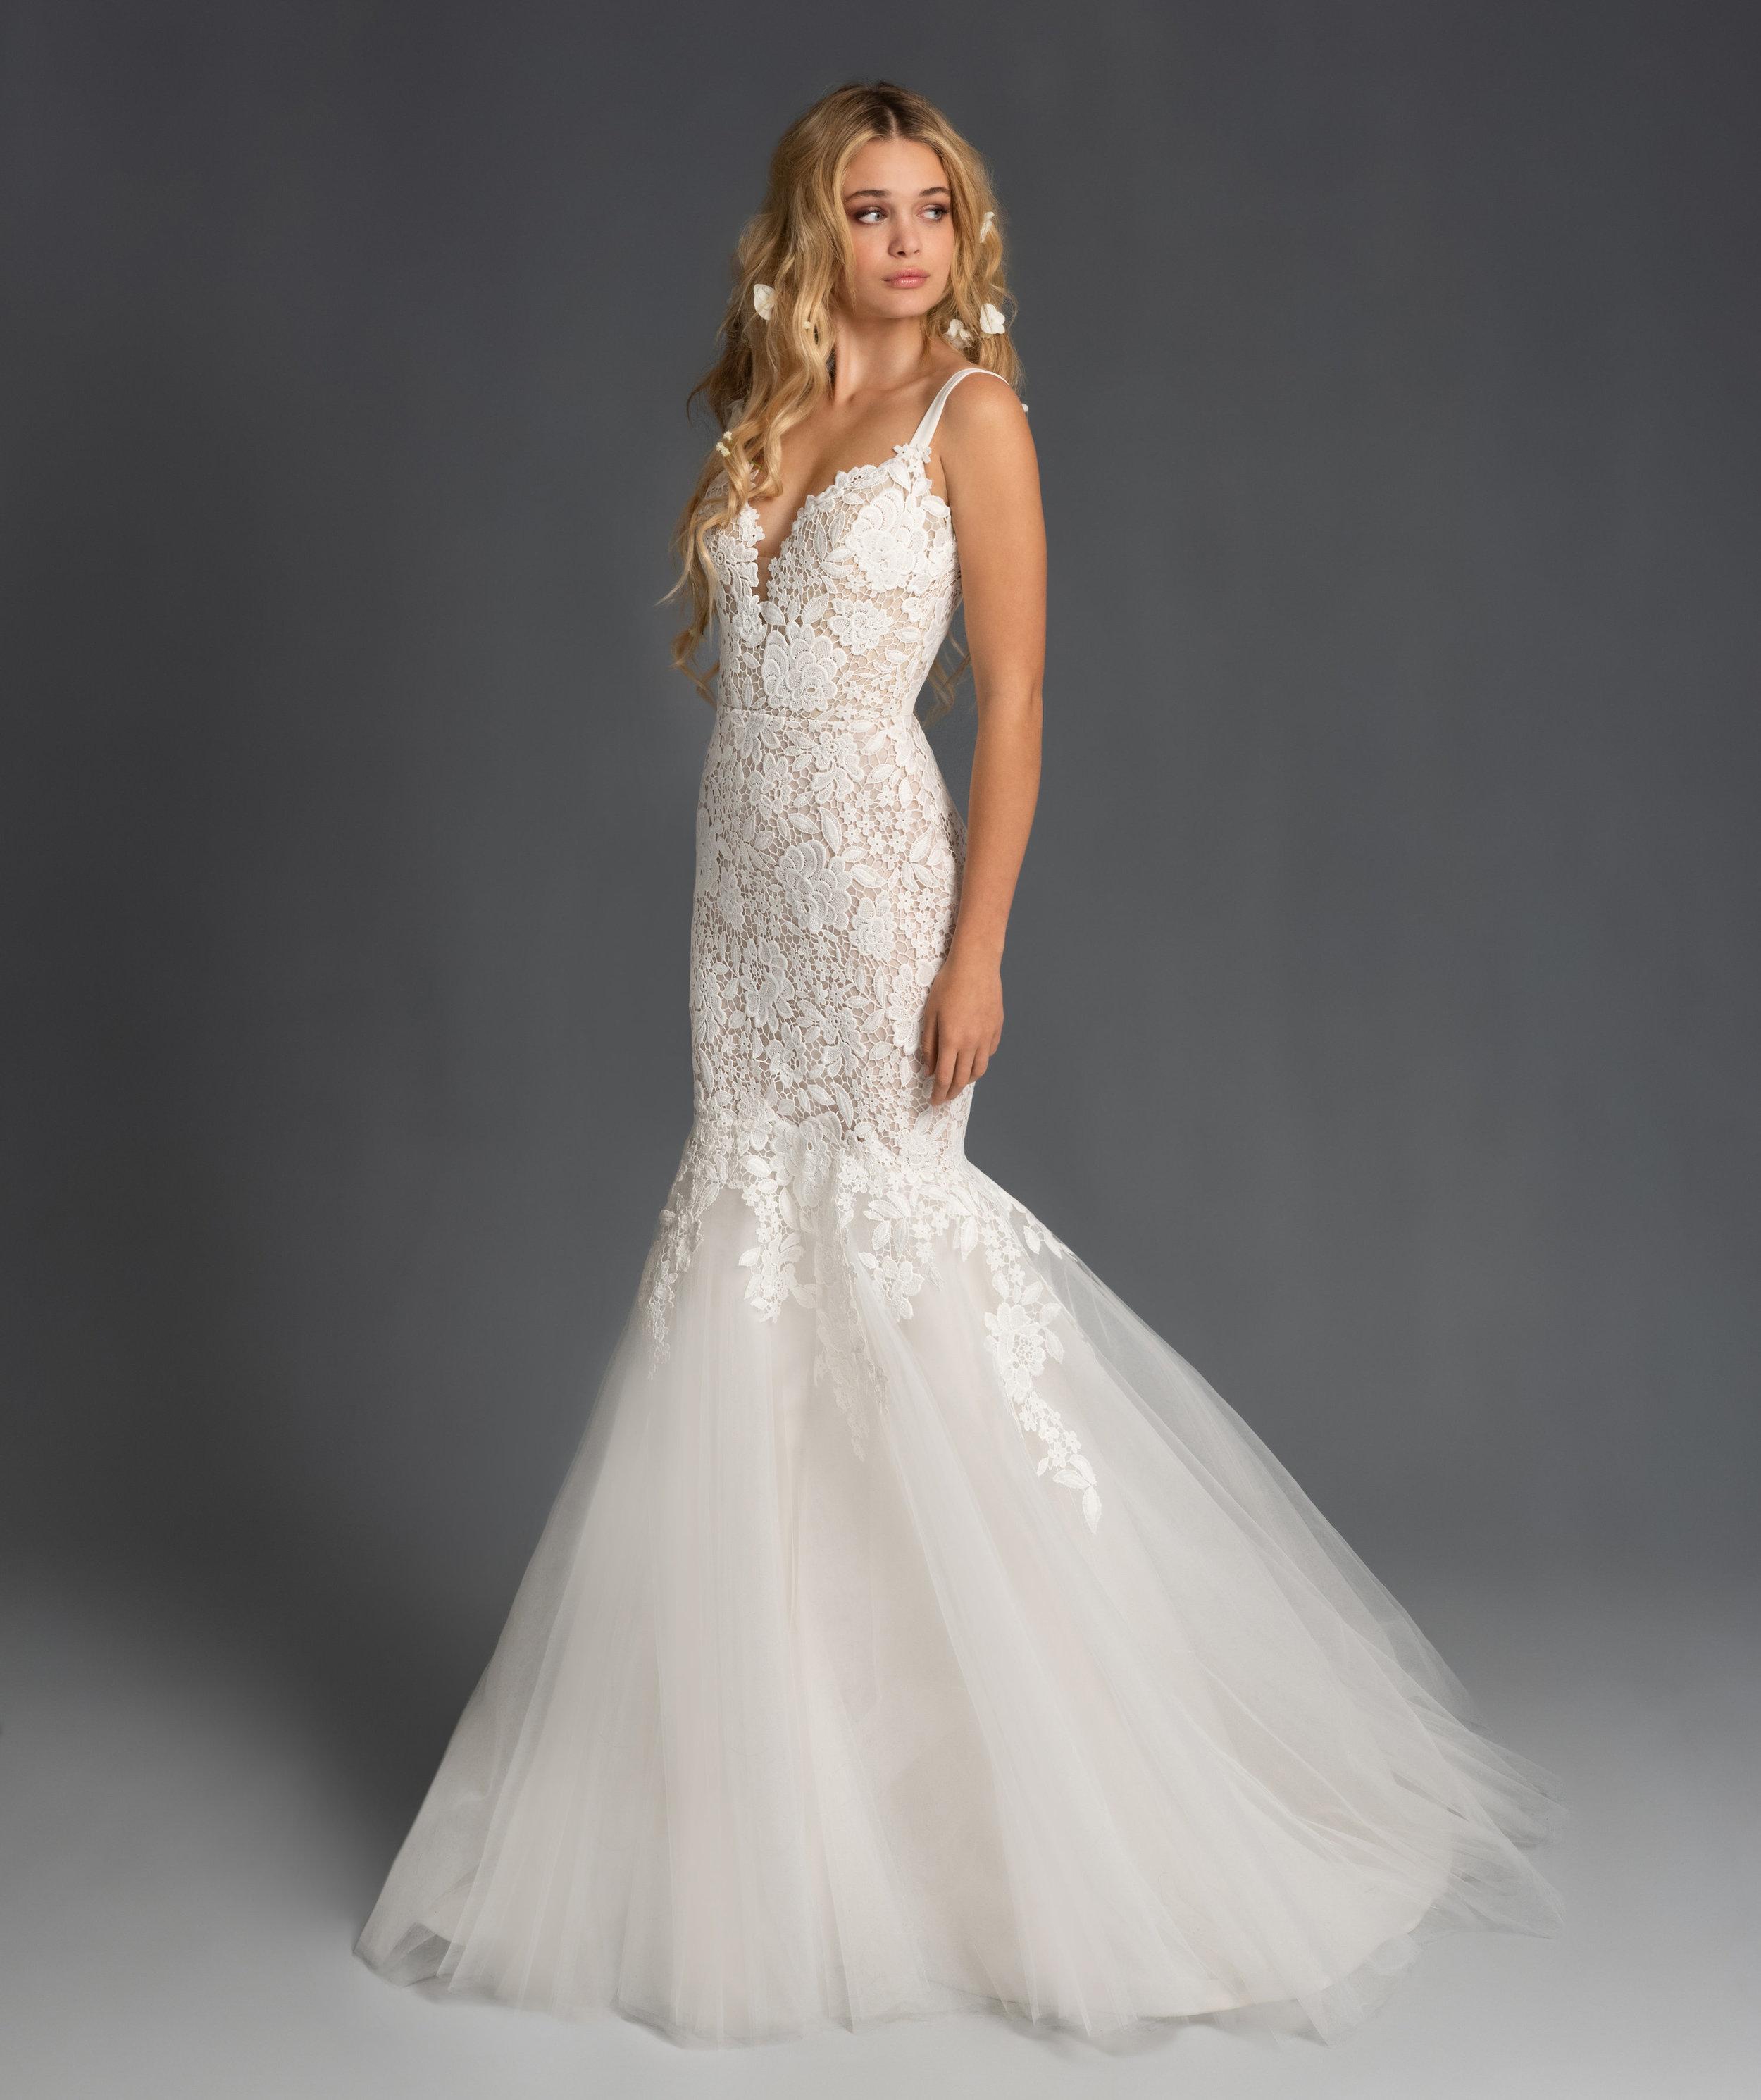 blush-hayley-paige-bridal-fall-2019-style-1955-pierre.jpg